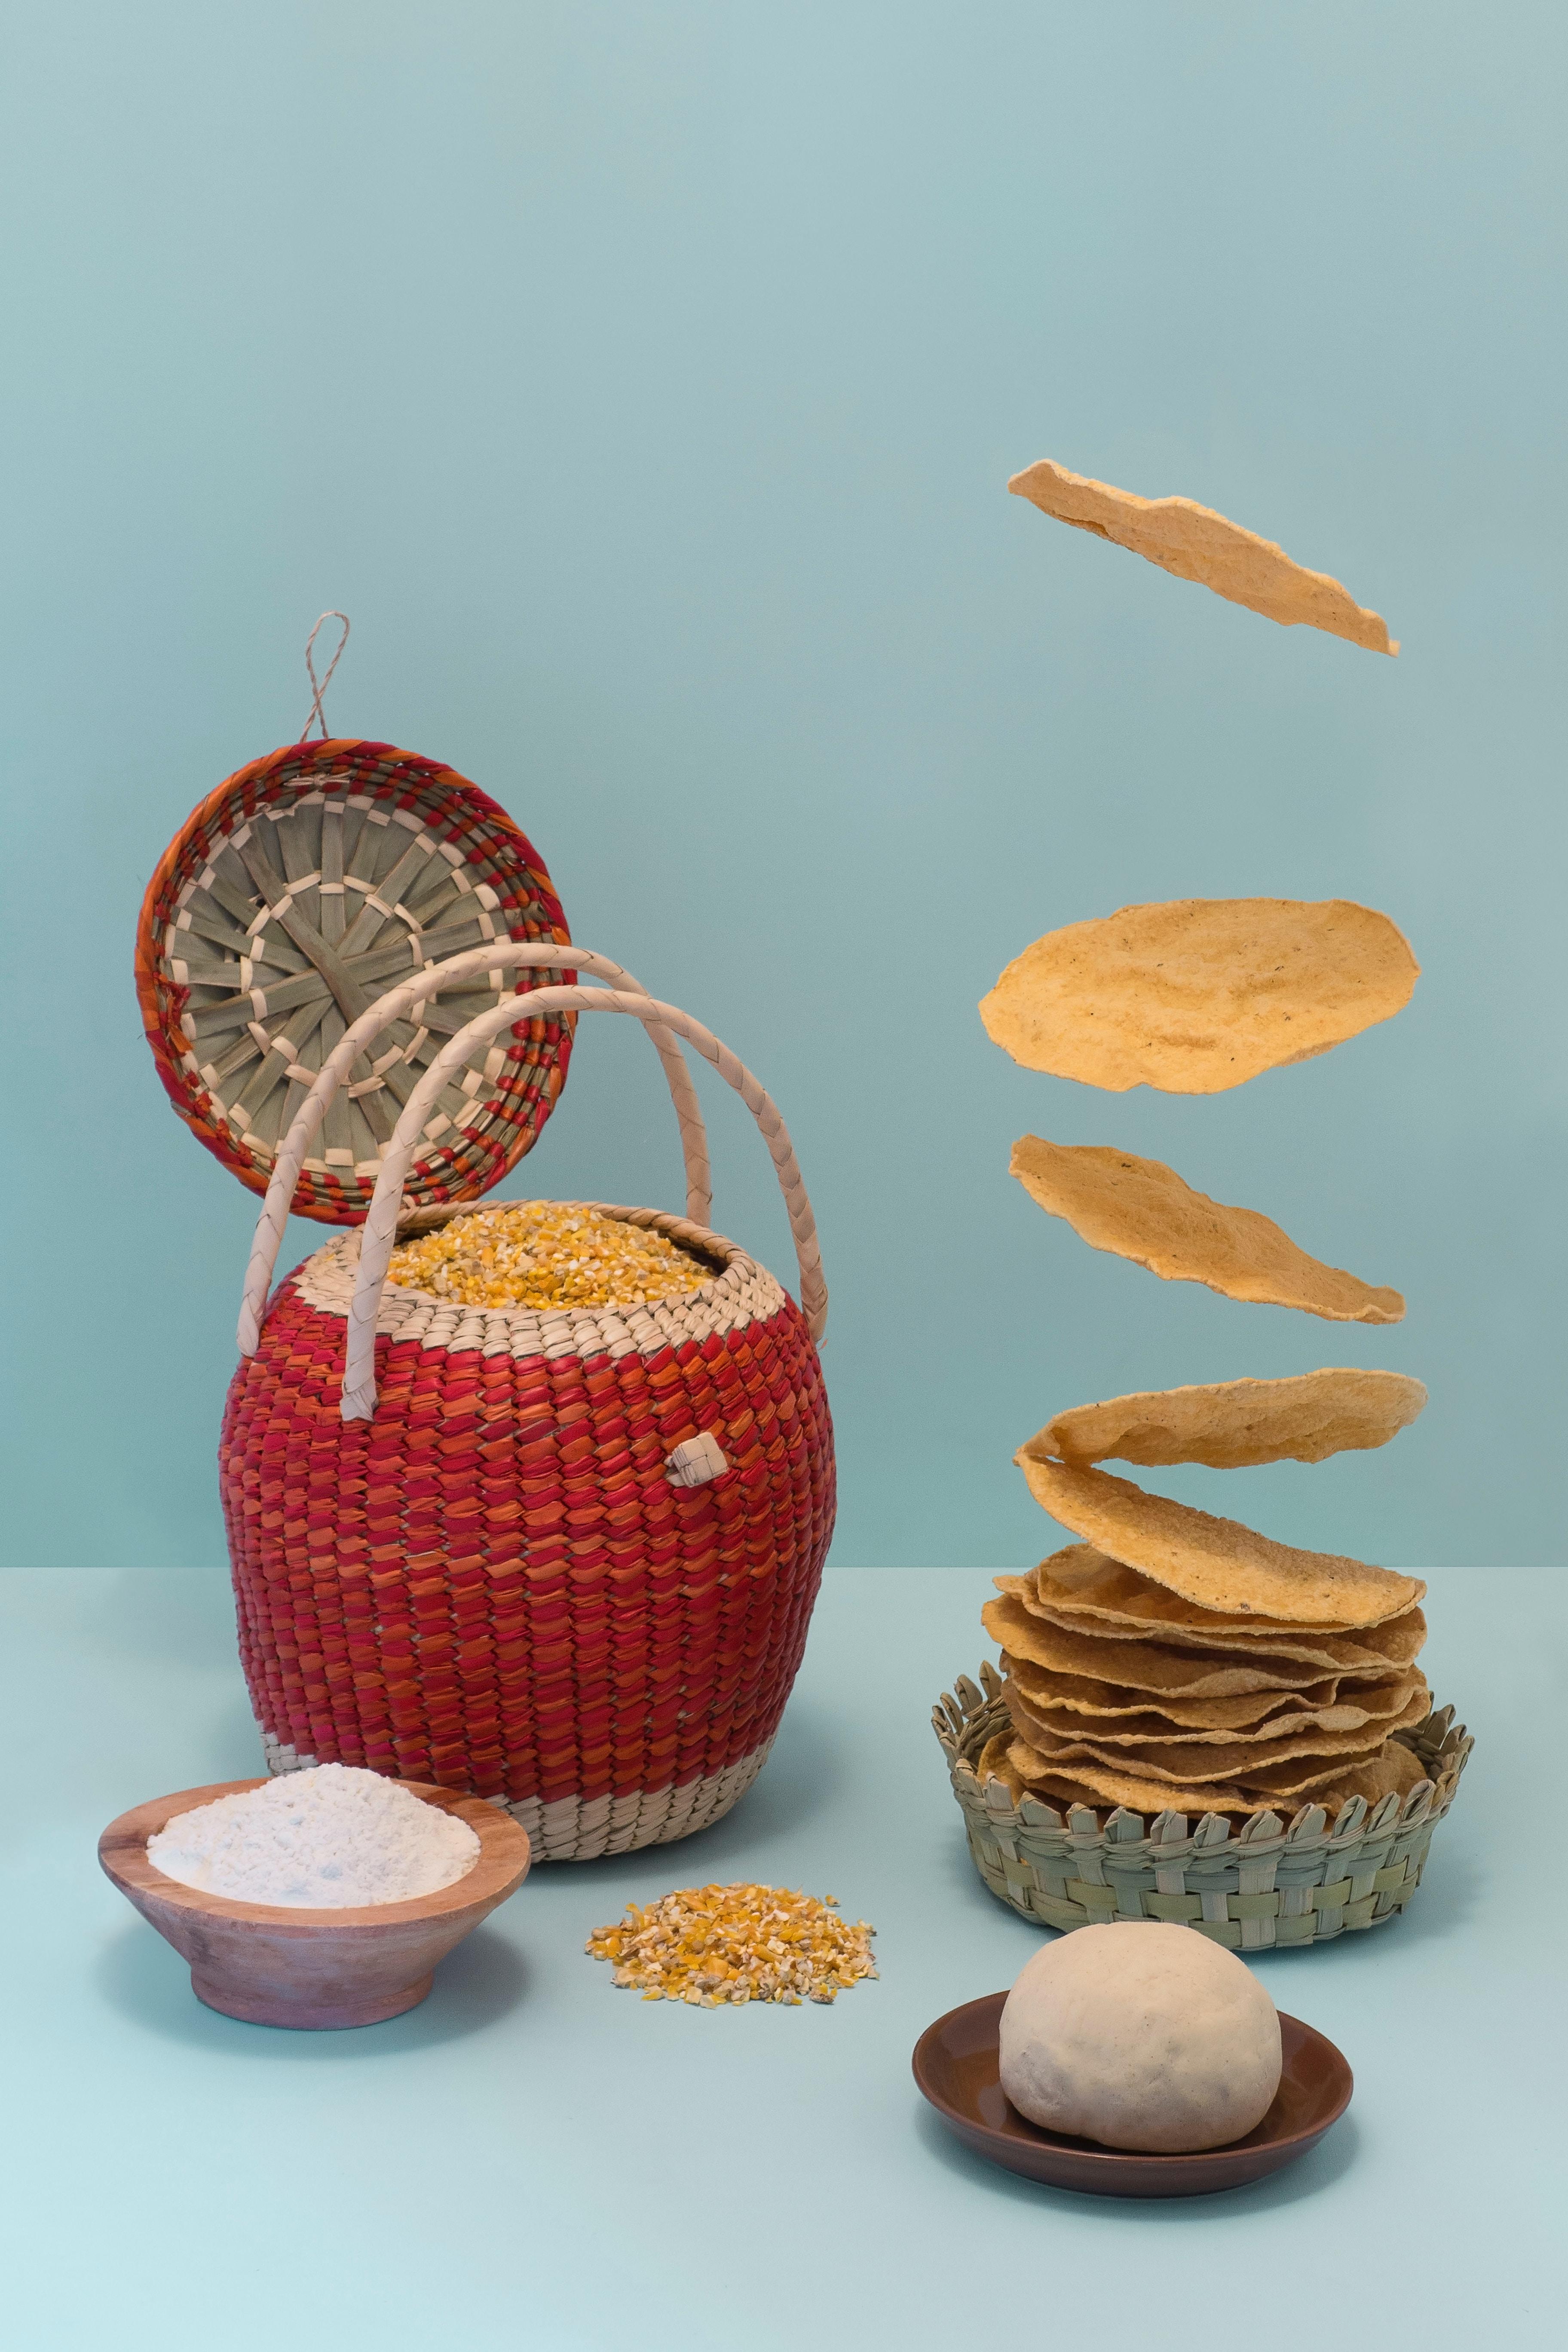 corn tortillas and basket